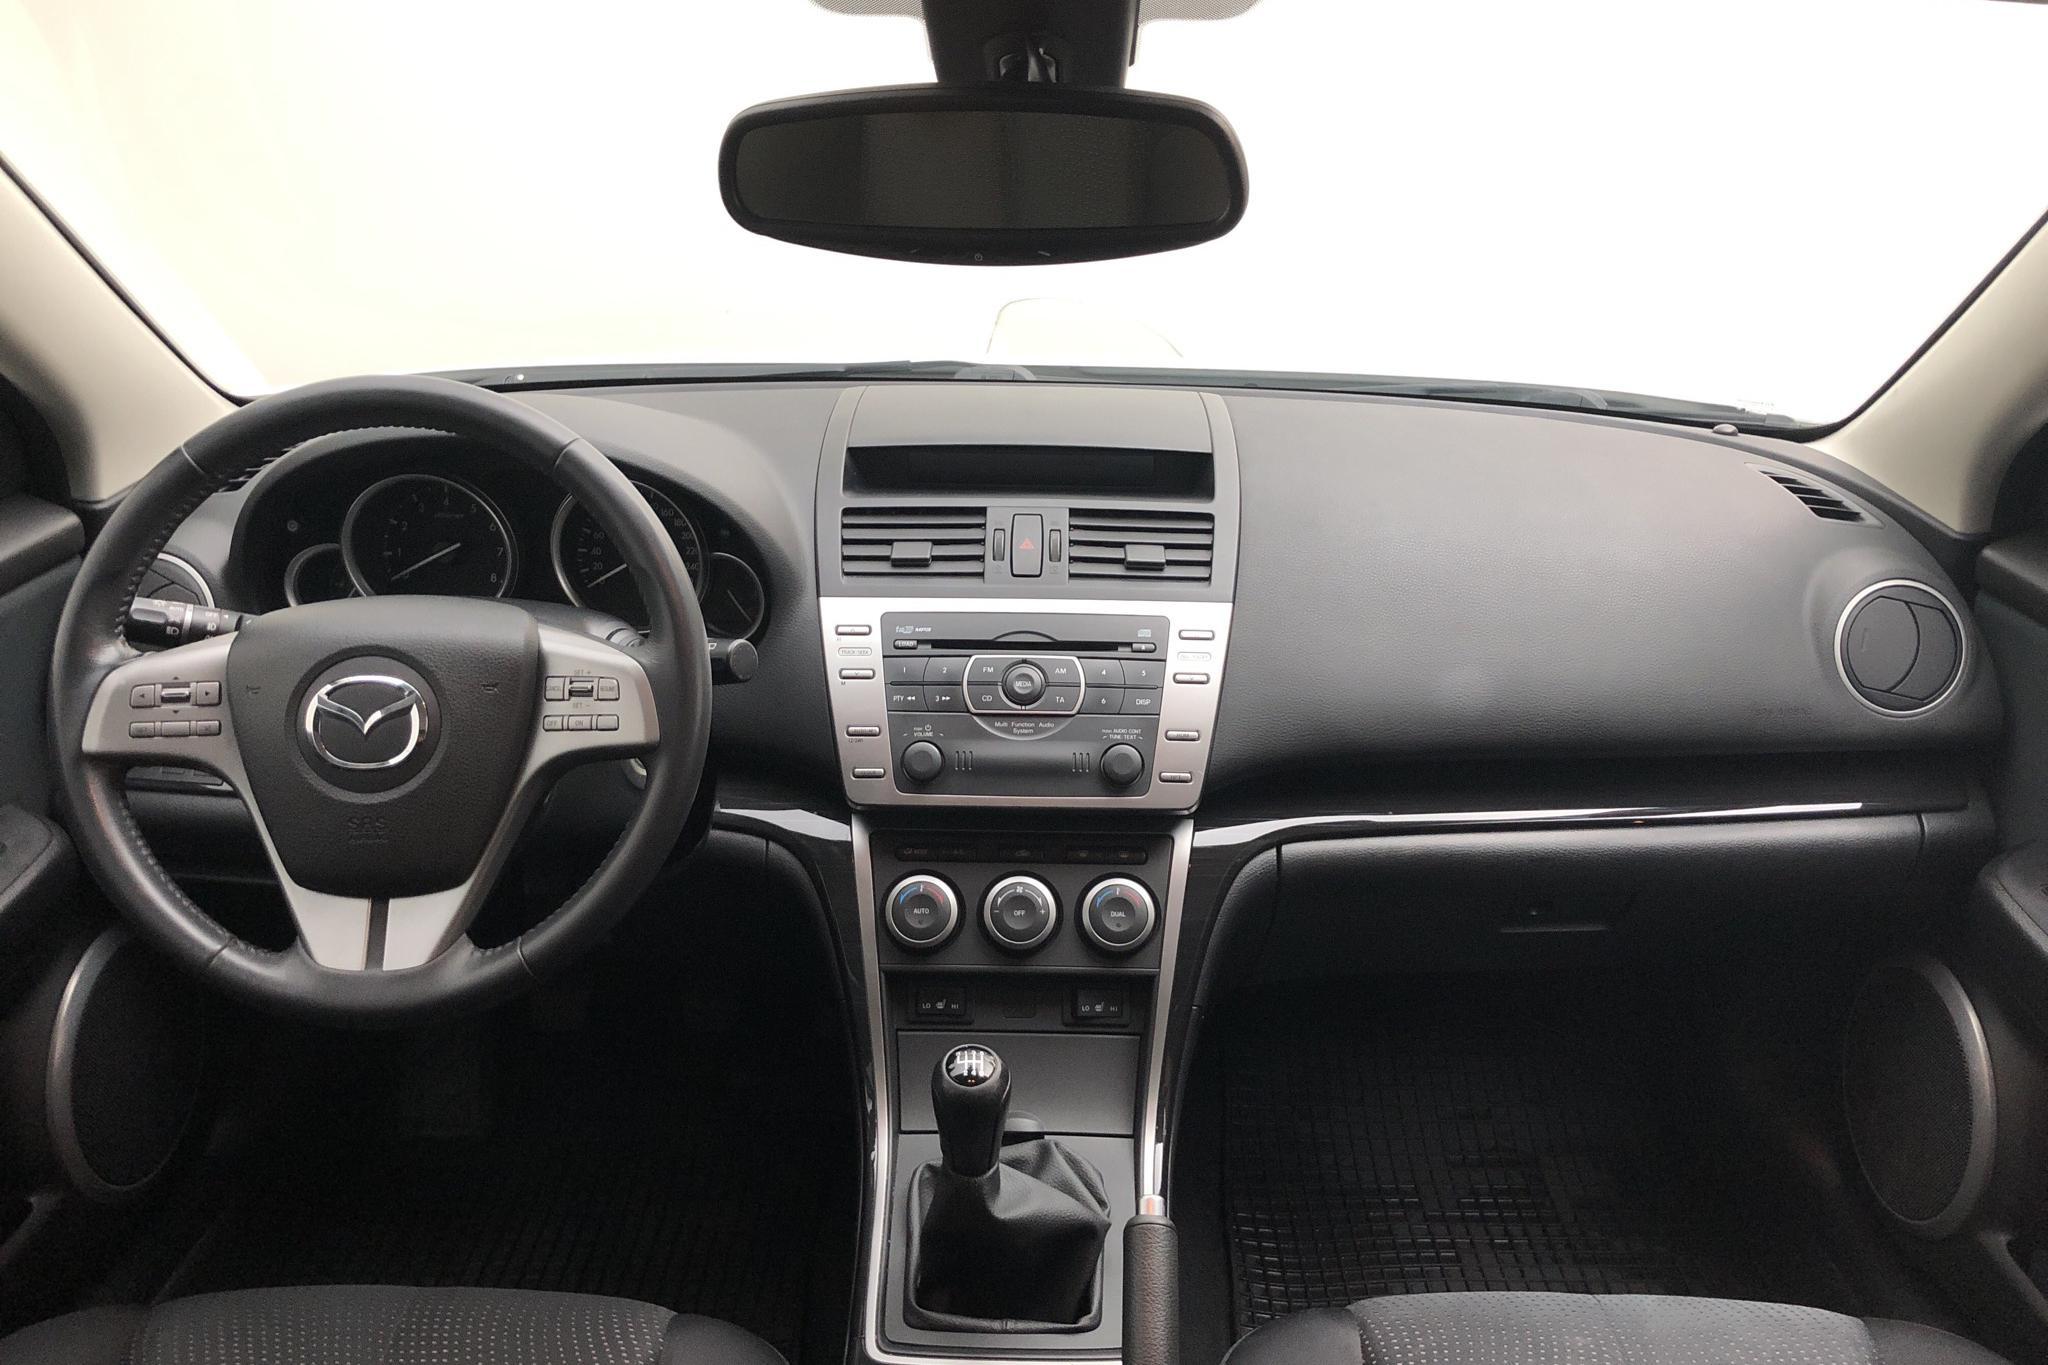 Mazda 6 2.0 Kombi (147hk) - 20 242 mil - Manuell - vit - 2009